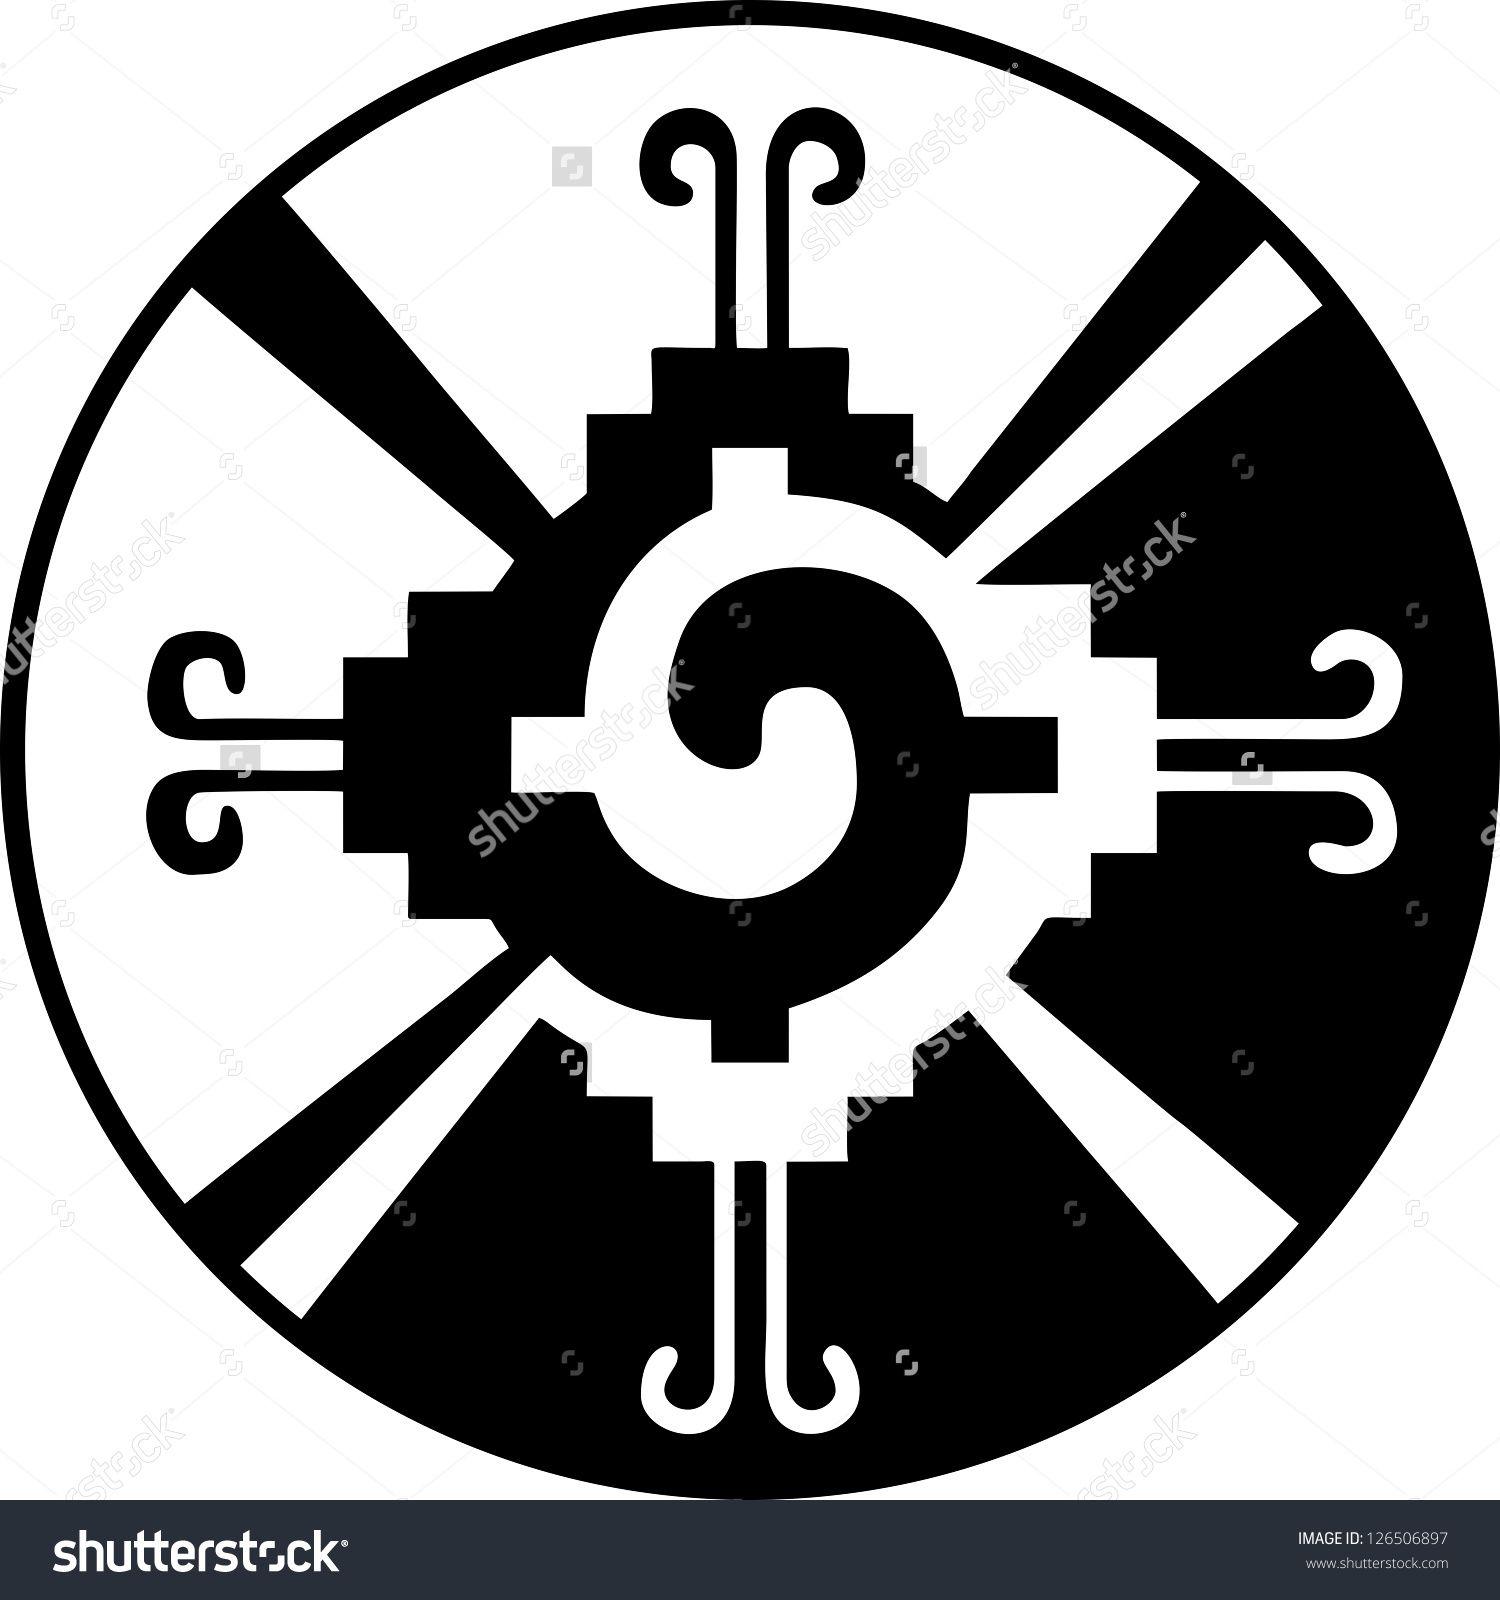 Hunab ku heart of the galaxy mayan symbol for god stock hunab ku heart of the galaxy mayan symbol for god stock vector biocorpaavc Gallery